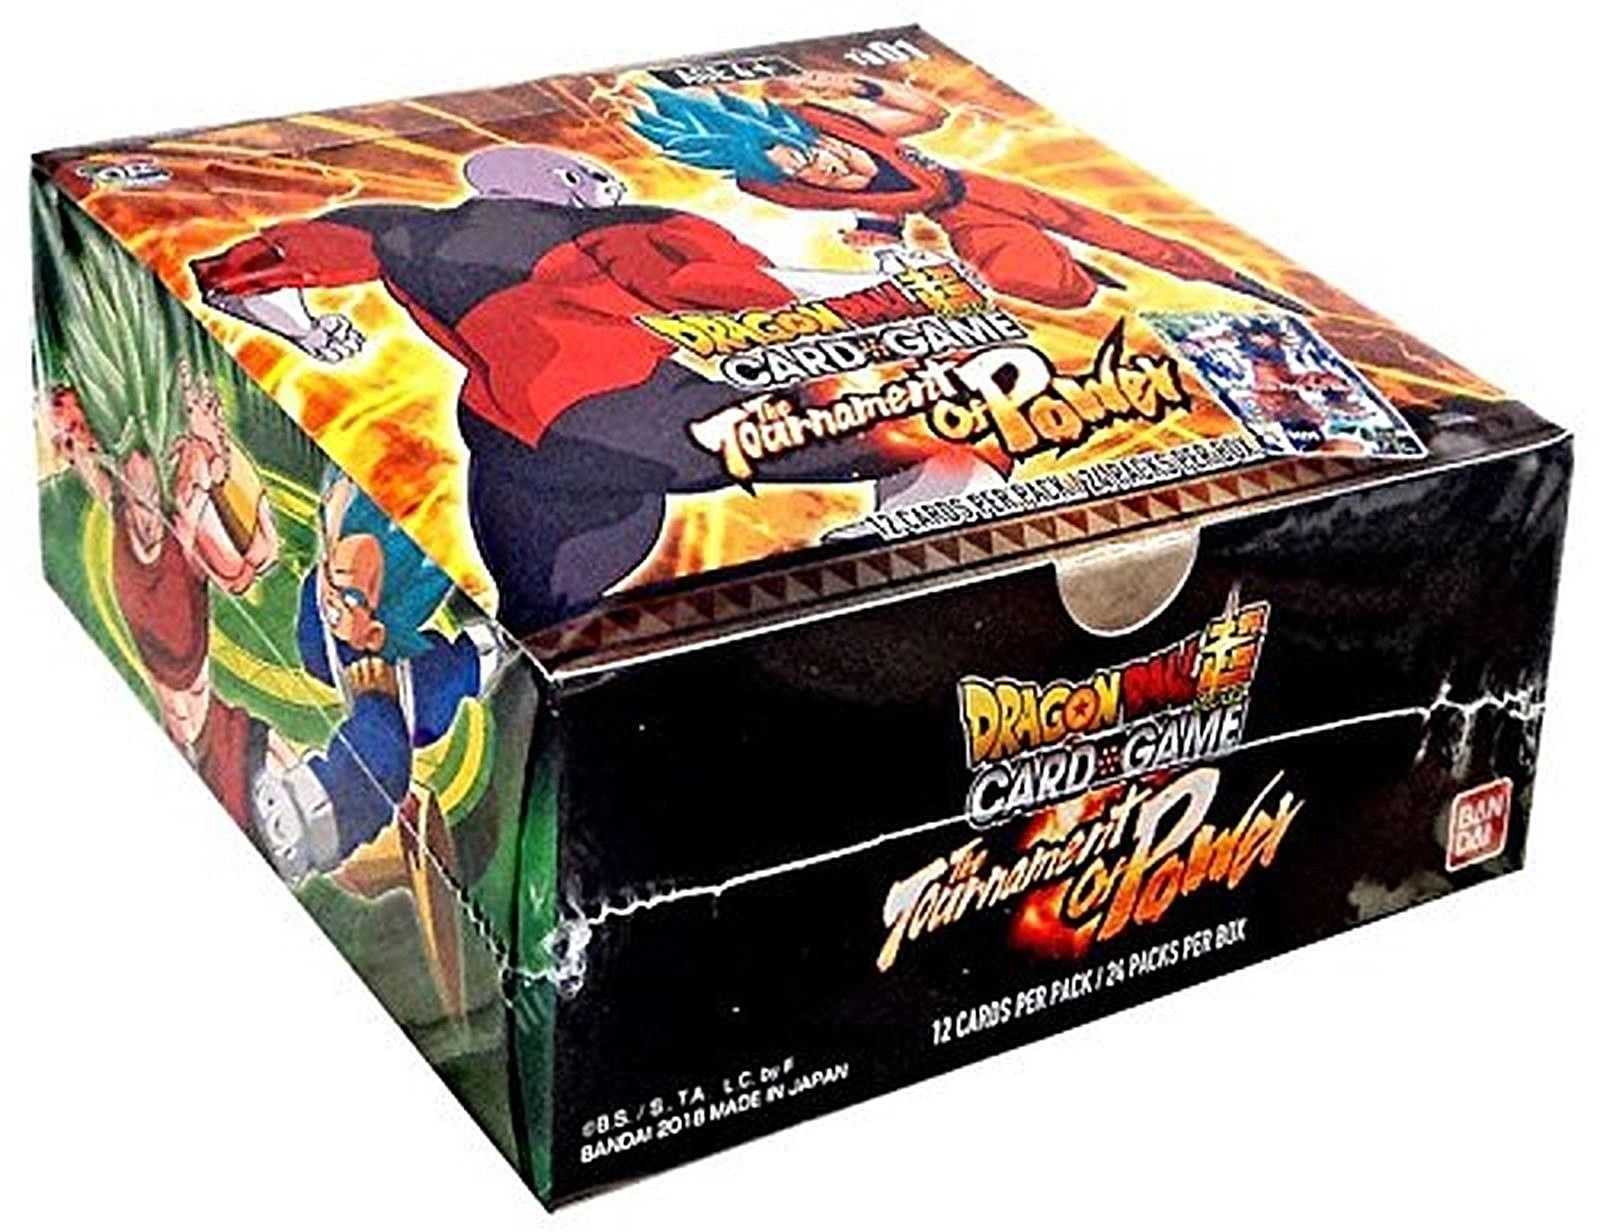 Ccg sealed booster packs 183456 dbs dragon ball super tcg